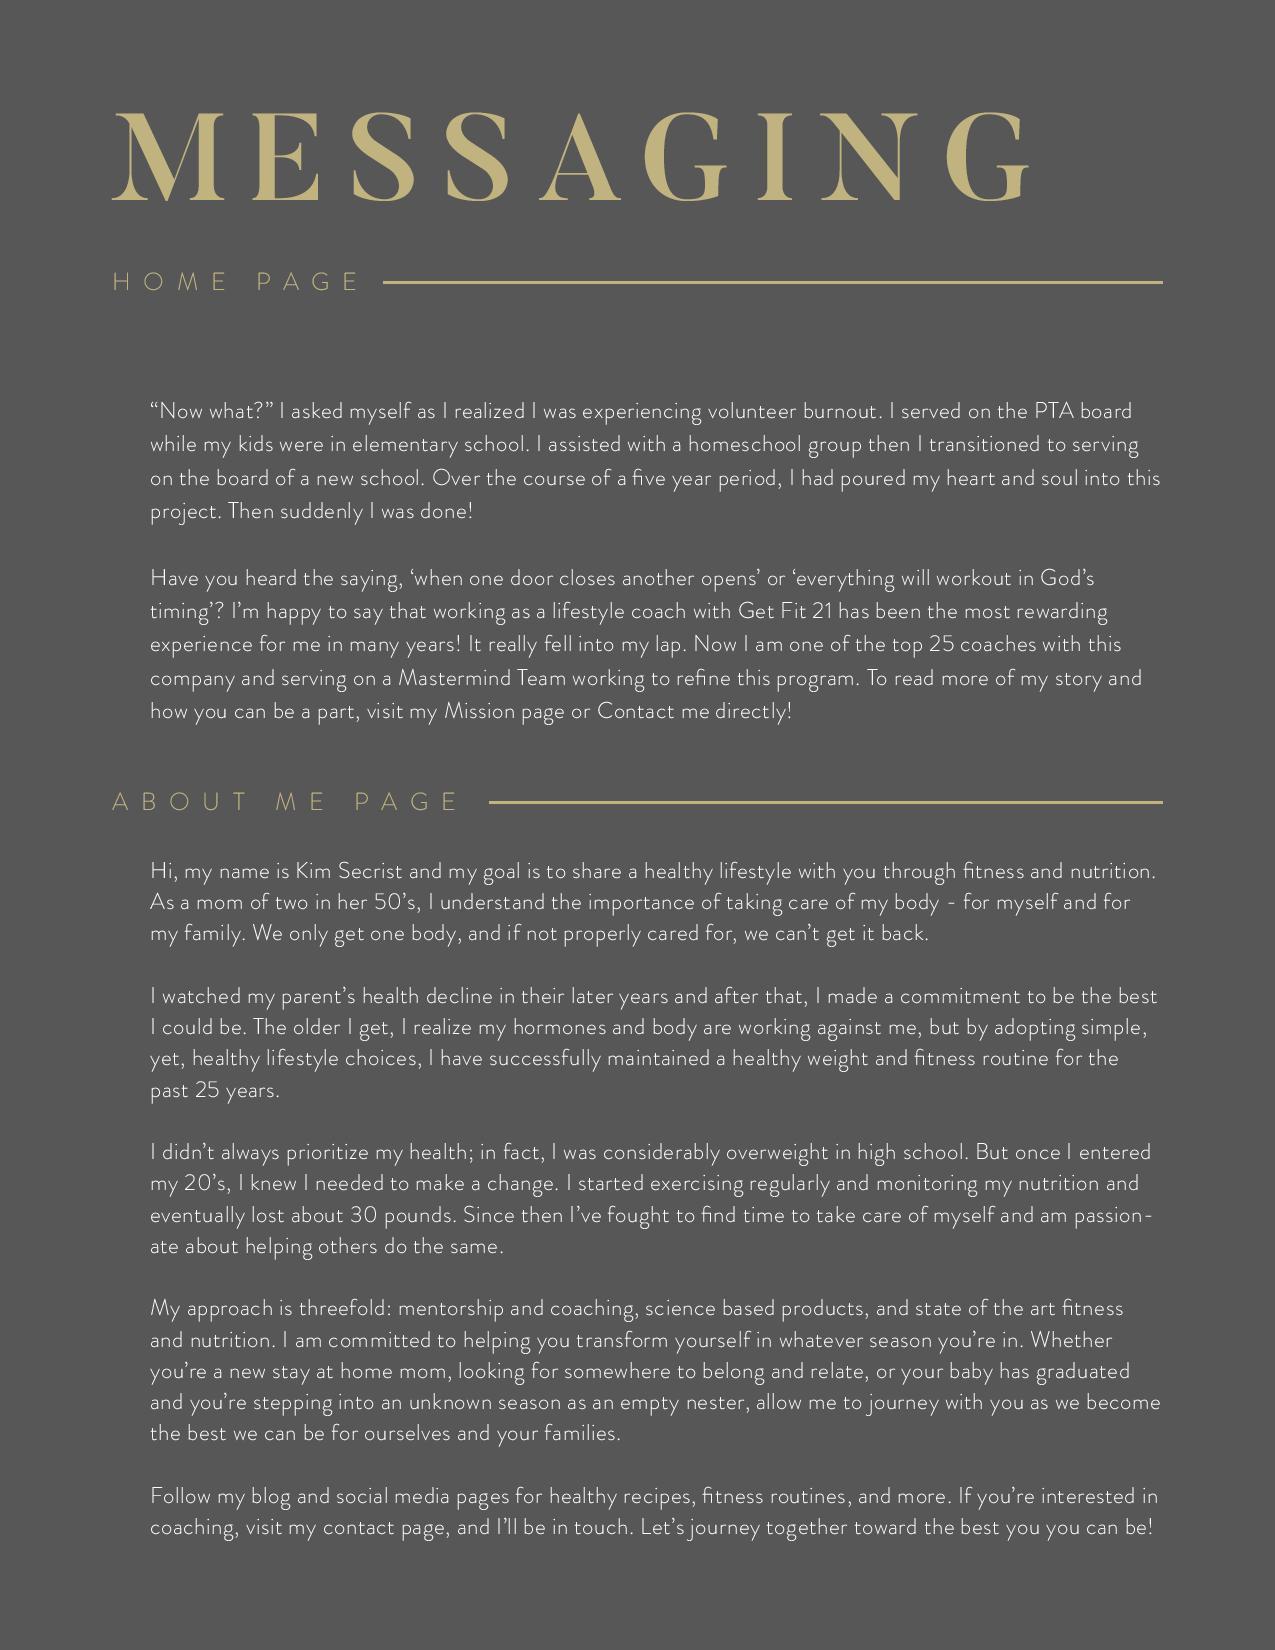 Kim Secrist Brand Guide-page-006.jpg